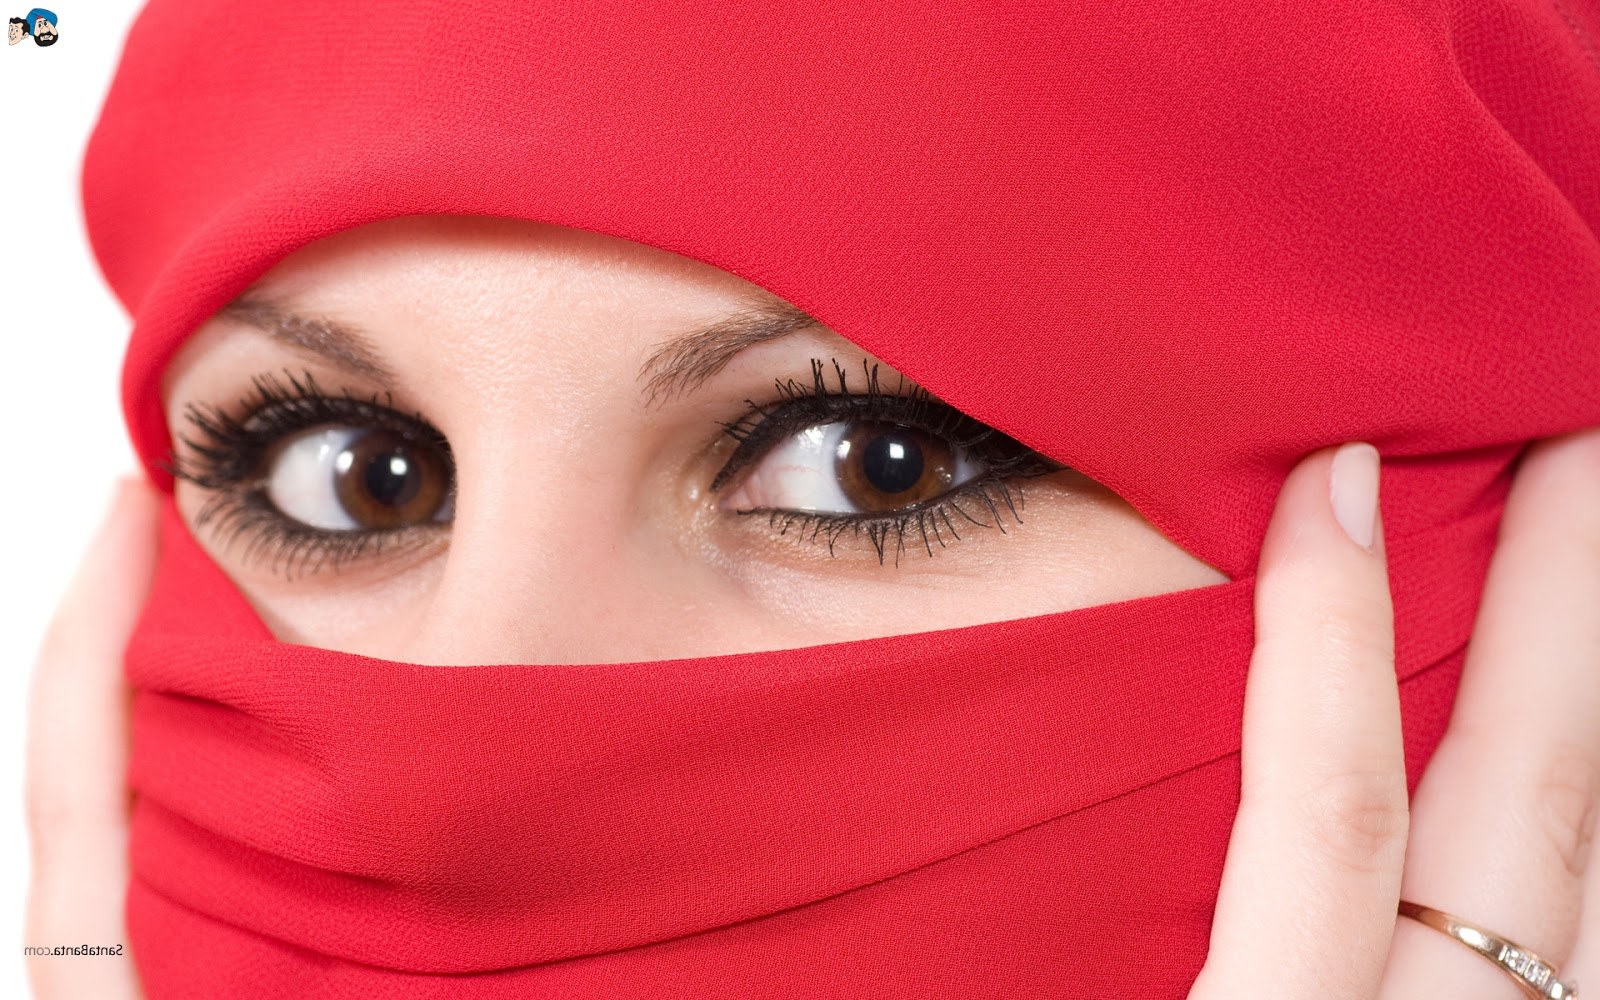 Design Muslimah Bercadar Memanah X8d1 Koleksi Wallpaper Wanita Muslimah Bercadar